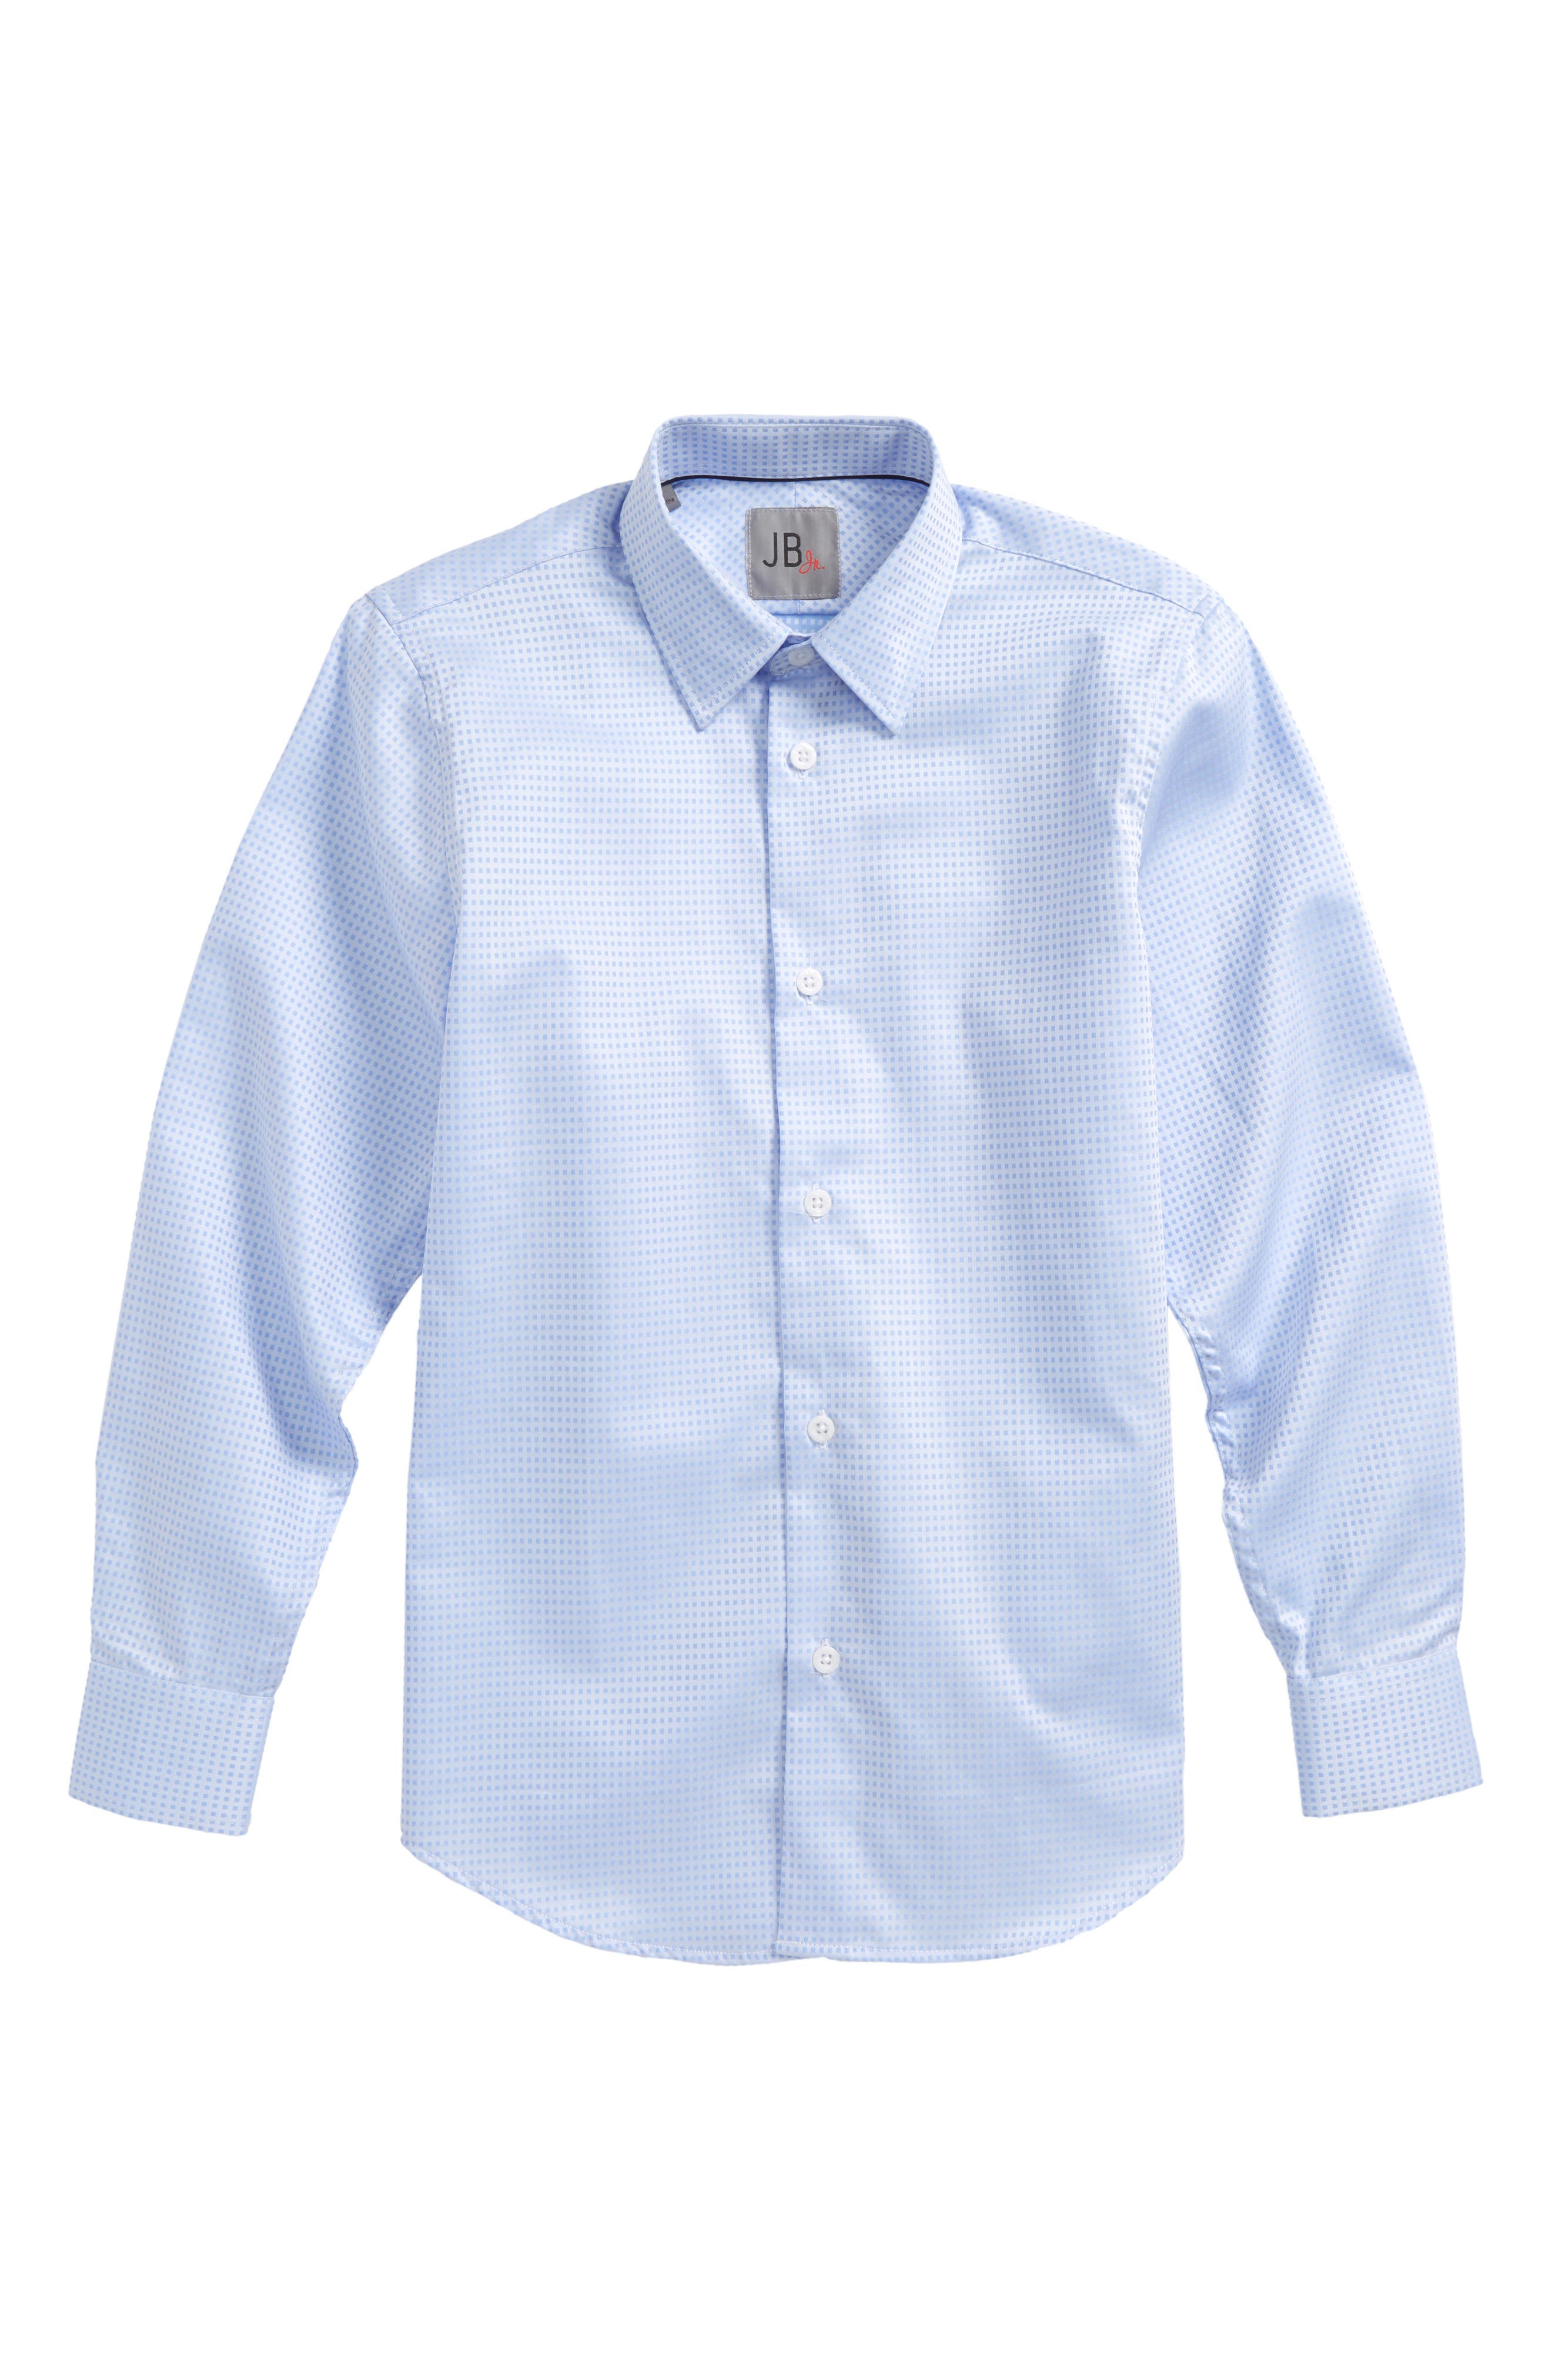 JB Jr Microcheck Dress Shirt (Big Boys)